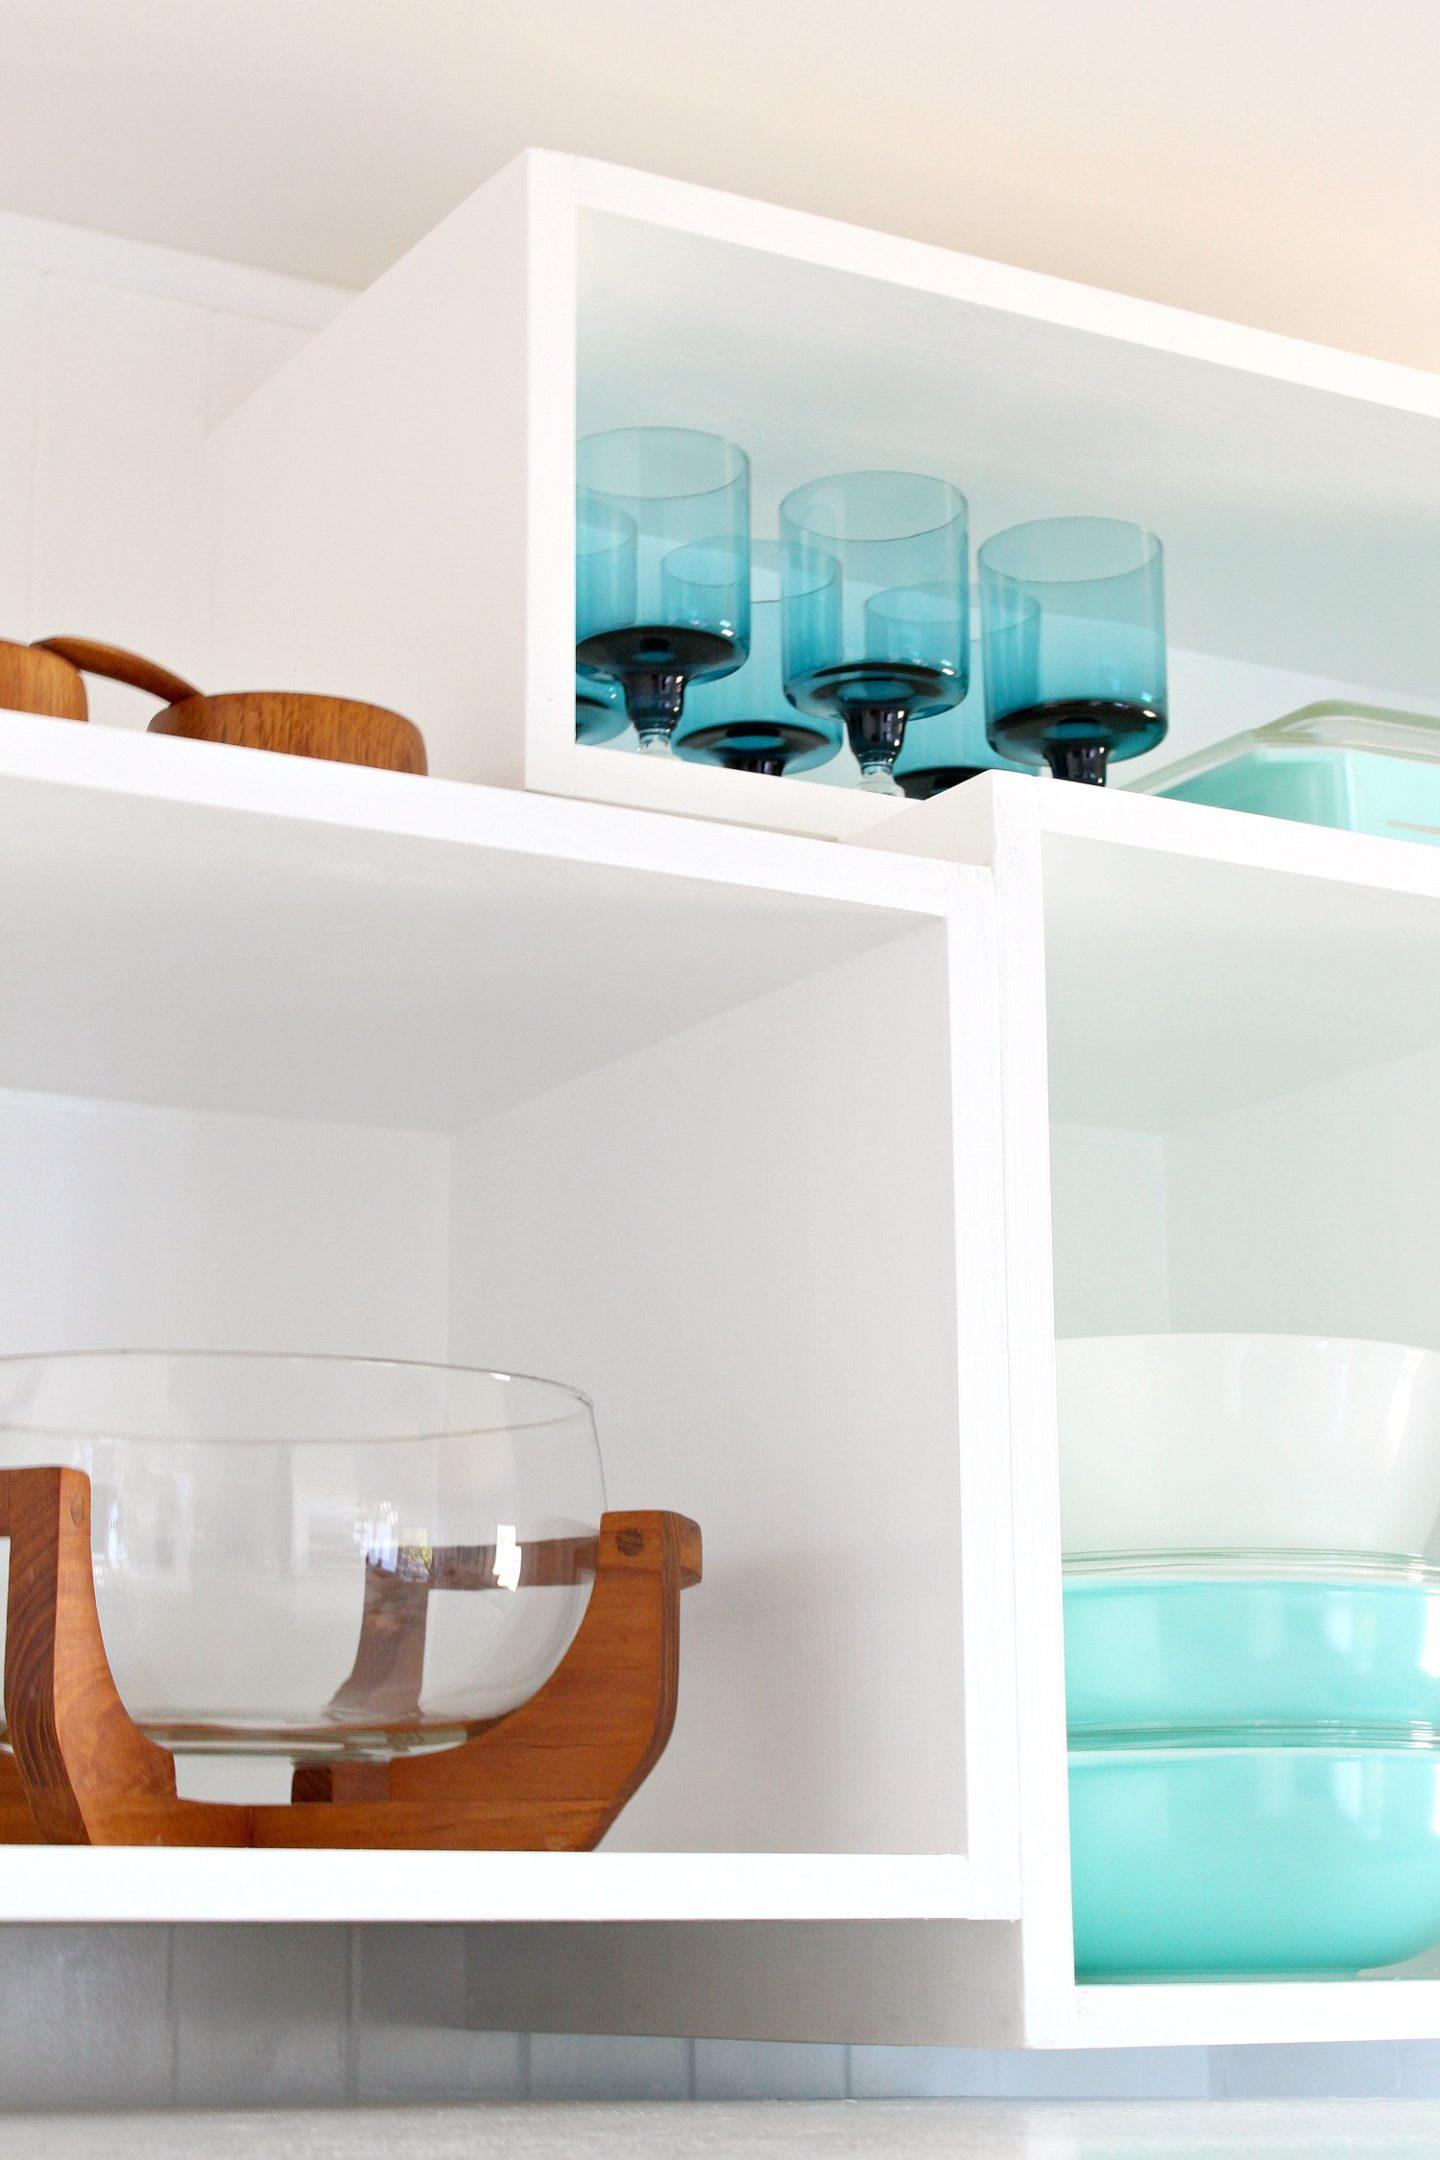 How to Build Wall Cubbies   Fresh Take on Kitchen Open Shelving #vintagekitchen #openshelving #budgetdiy #diyhomedecor